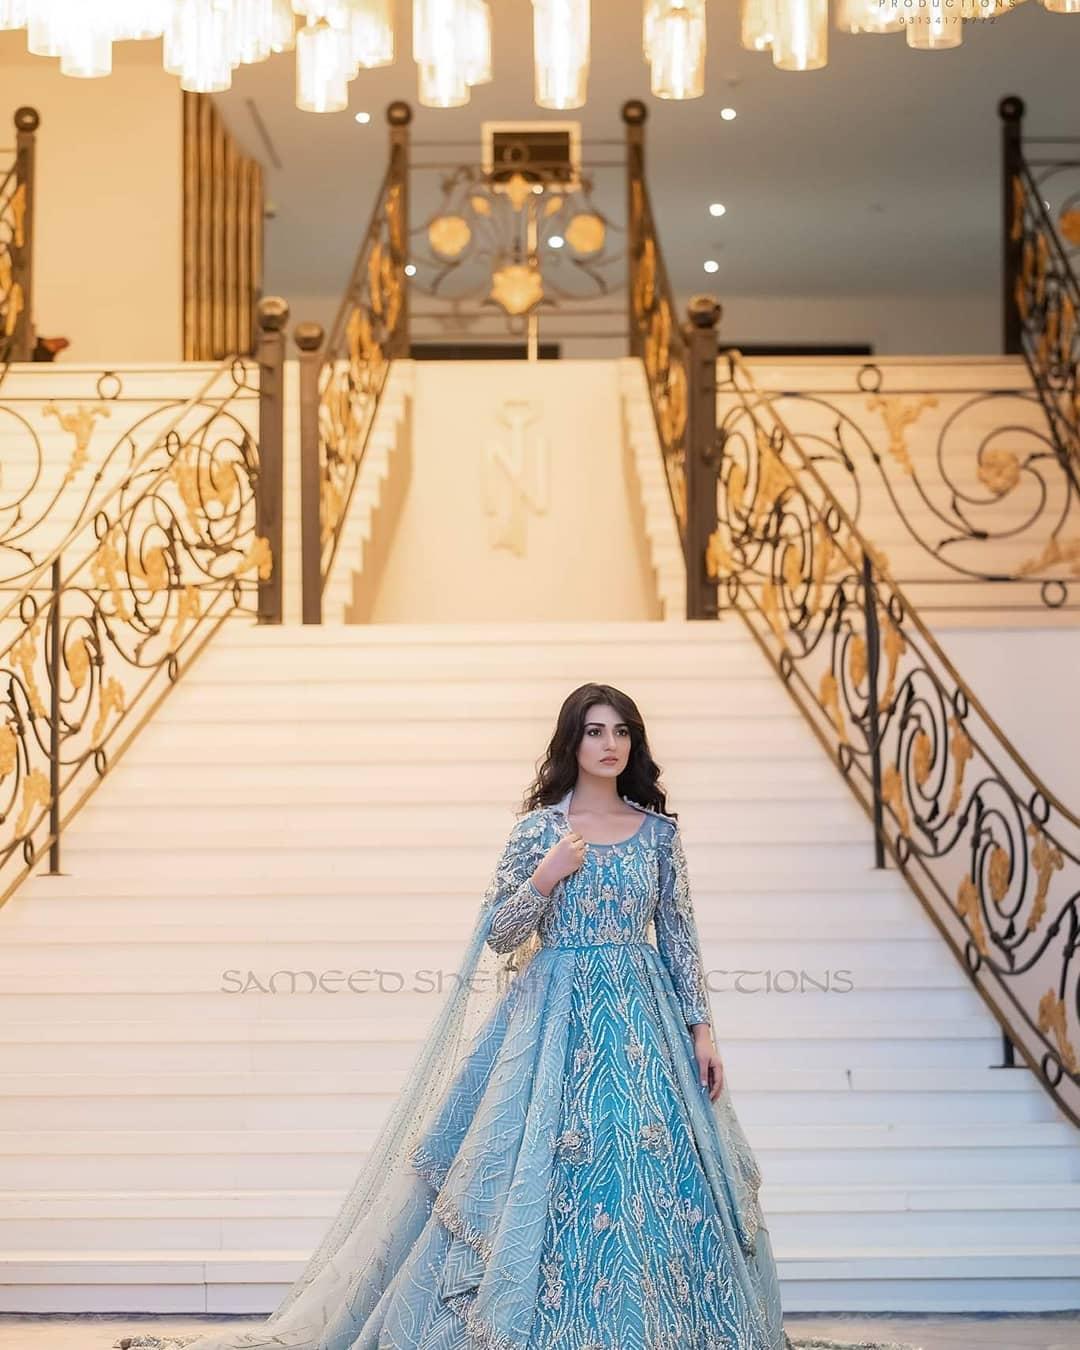 Pakistani Model Sarah Khan Photoshoot (5)